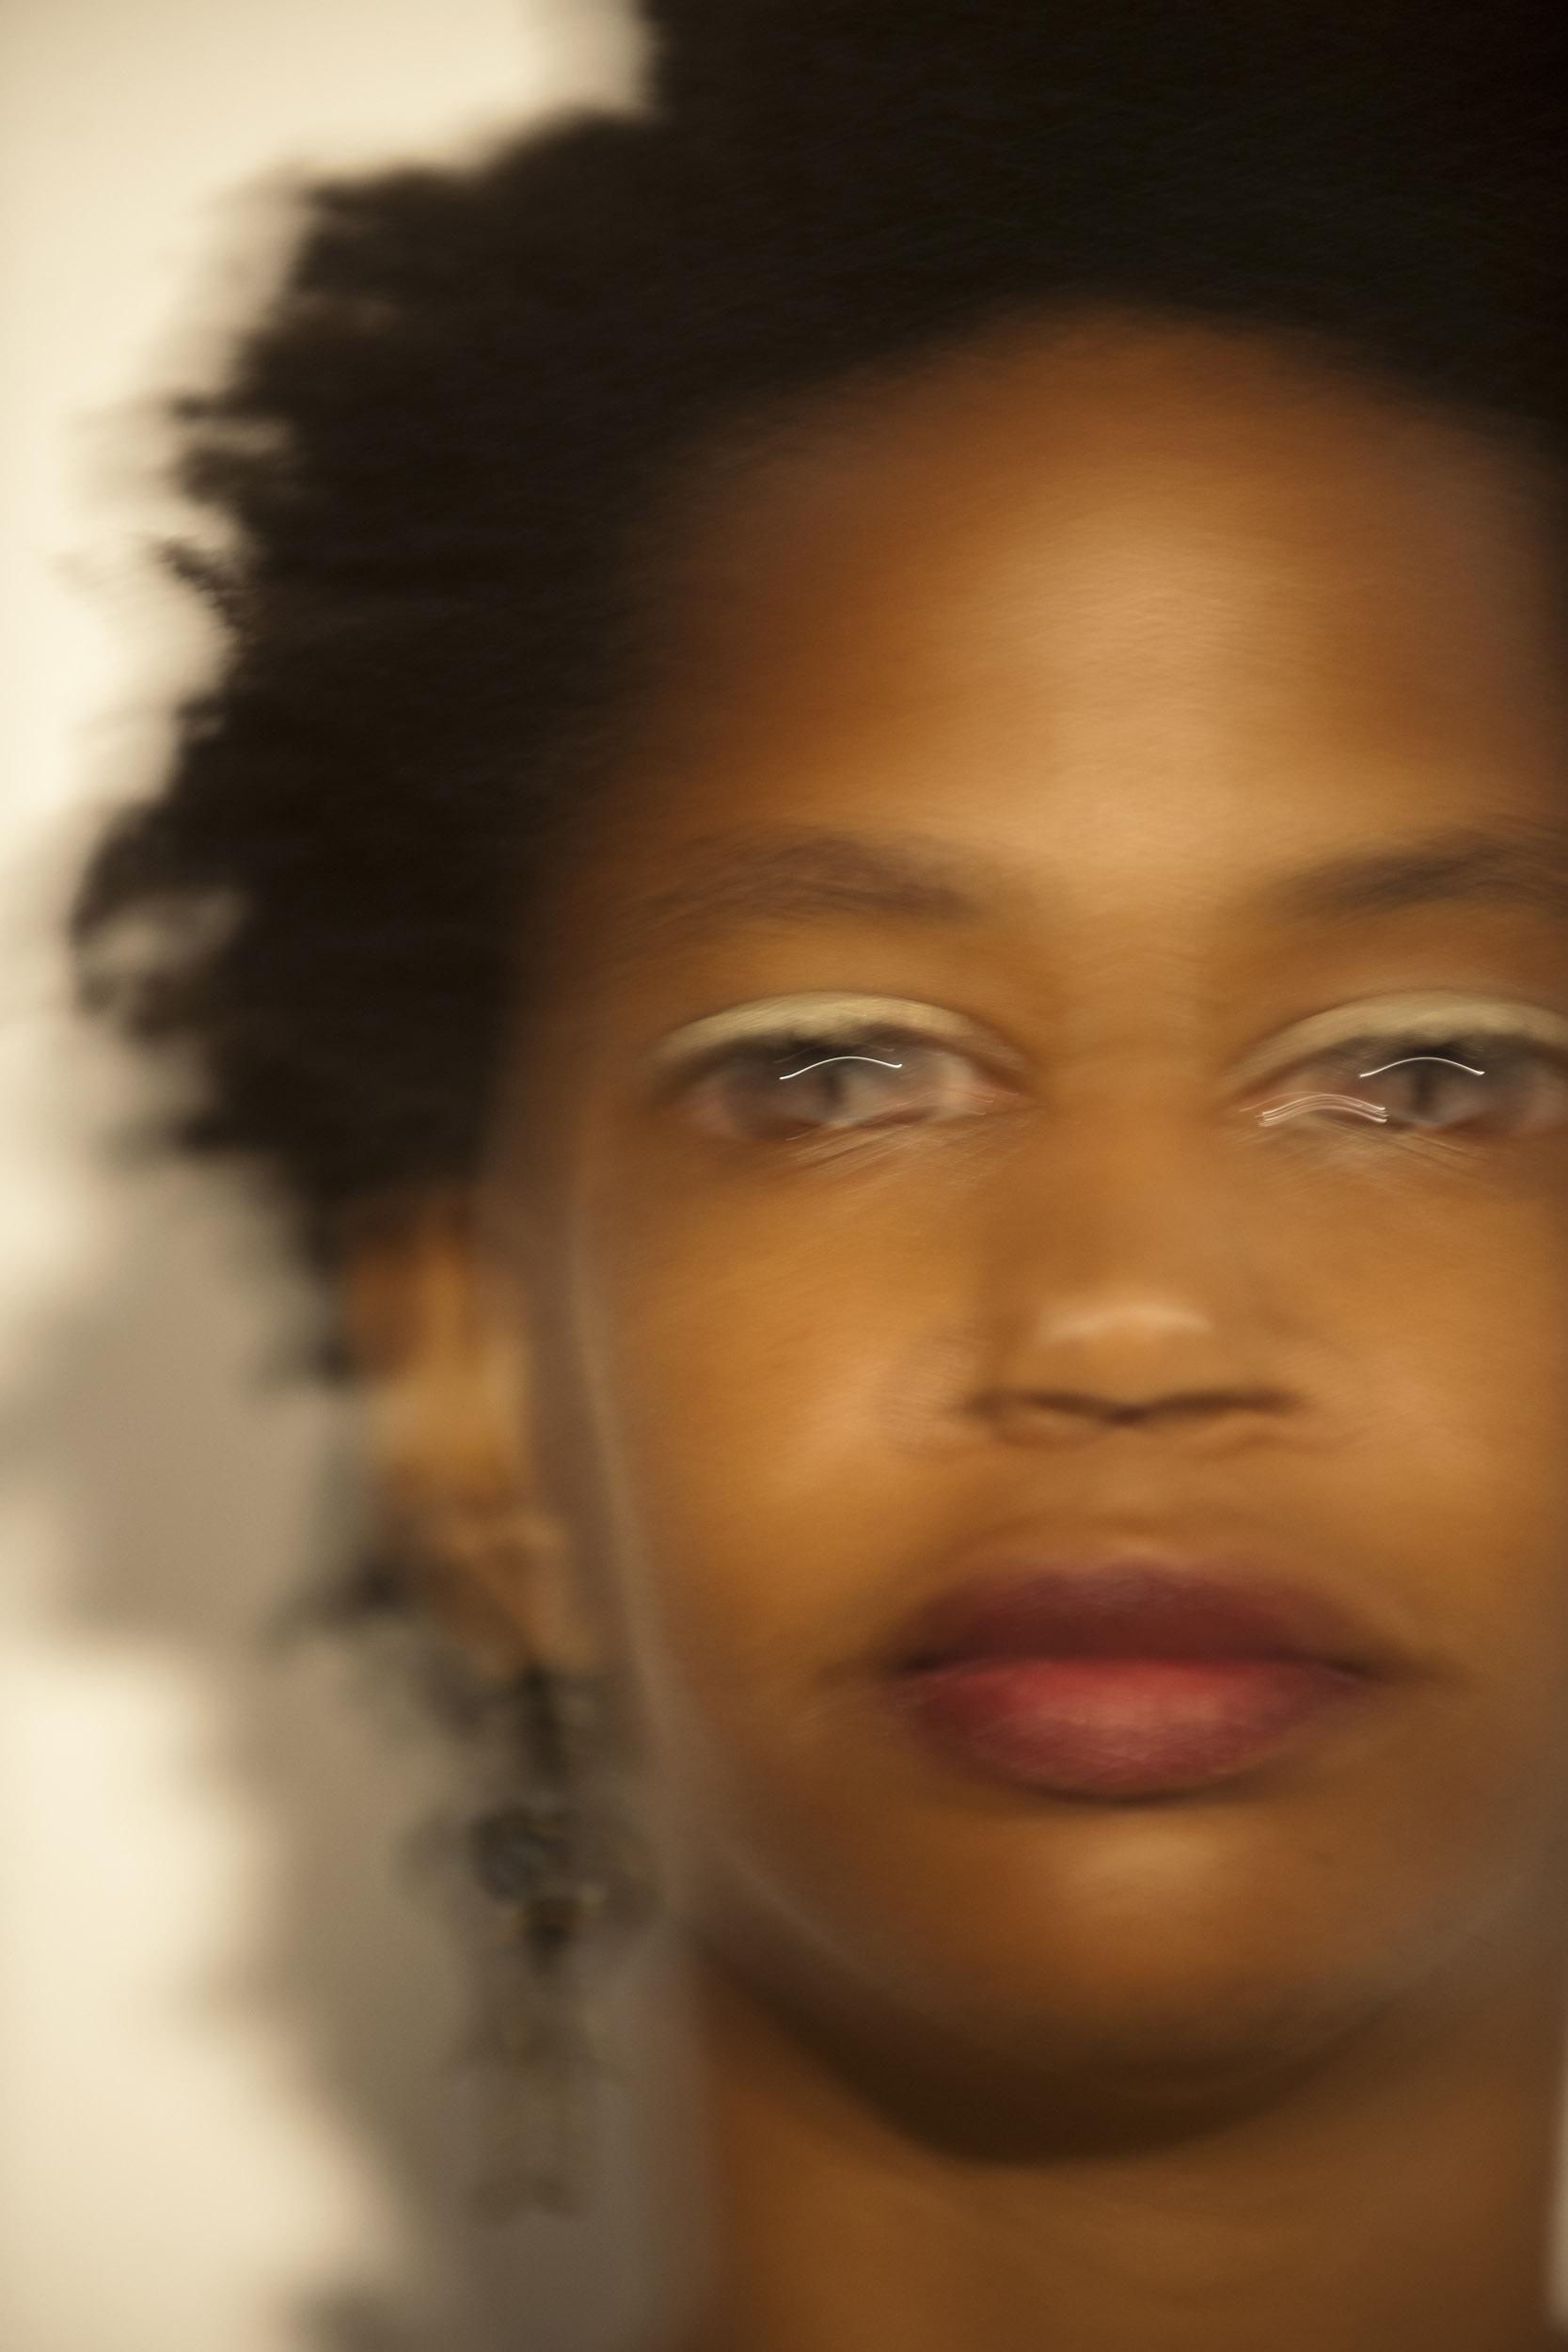 Susana Pilar Delahante, artist - Illuminated Cuba - Hector Garrido, Aerial and human photography